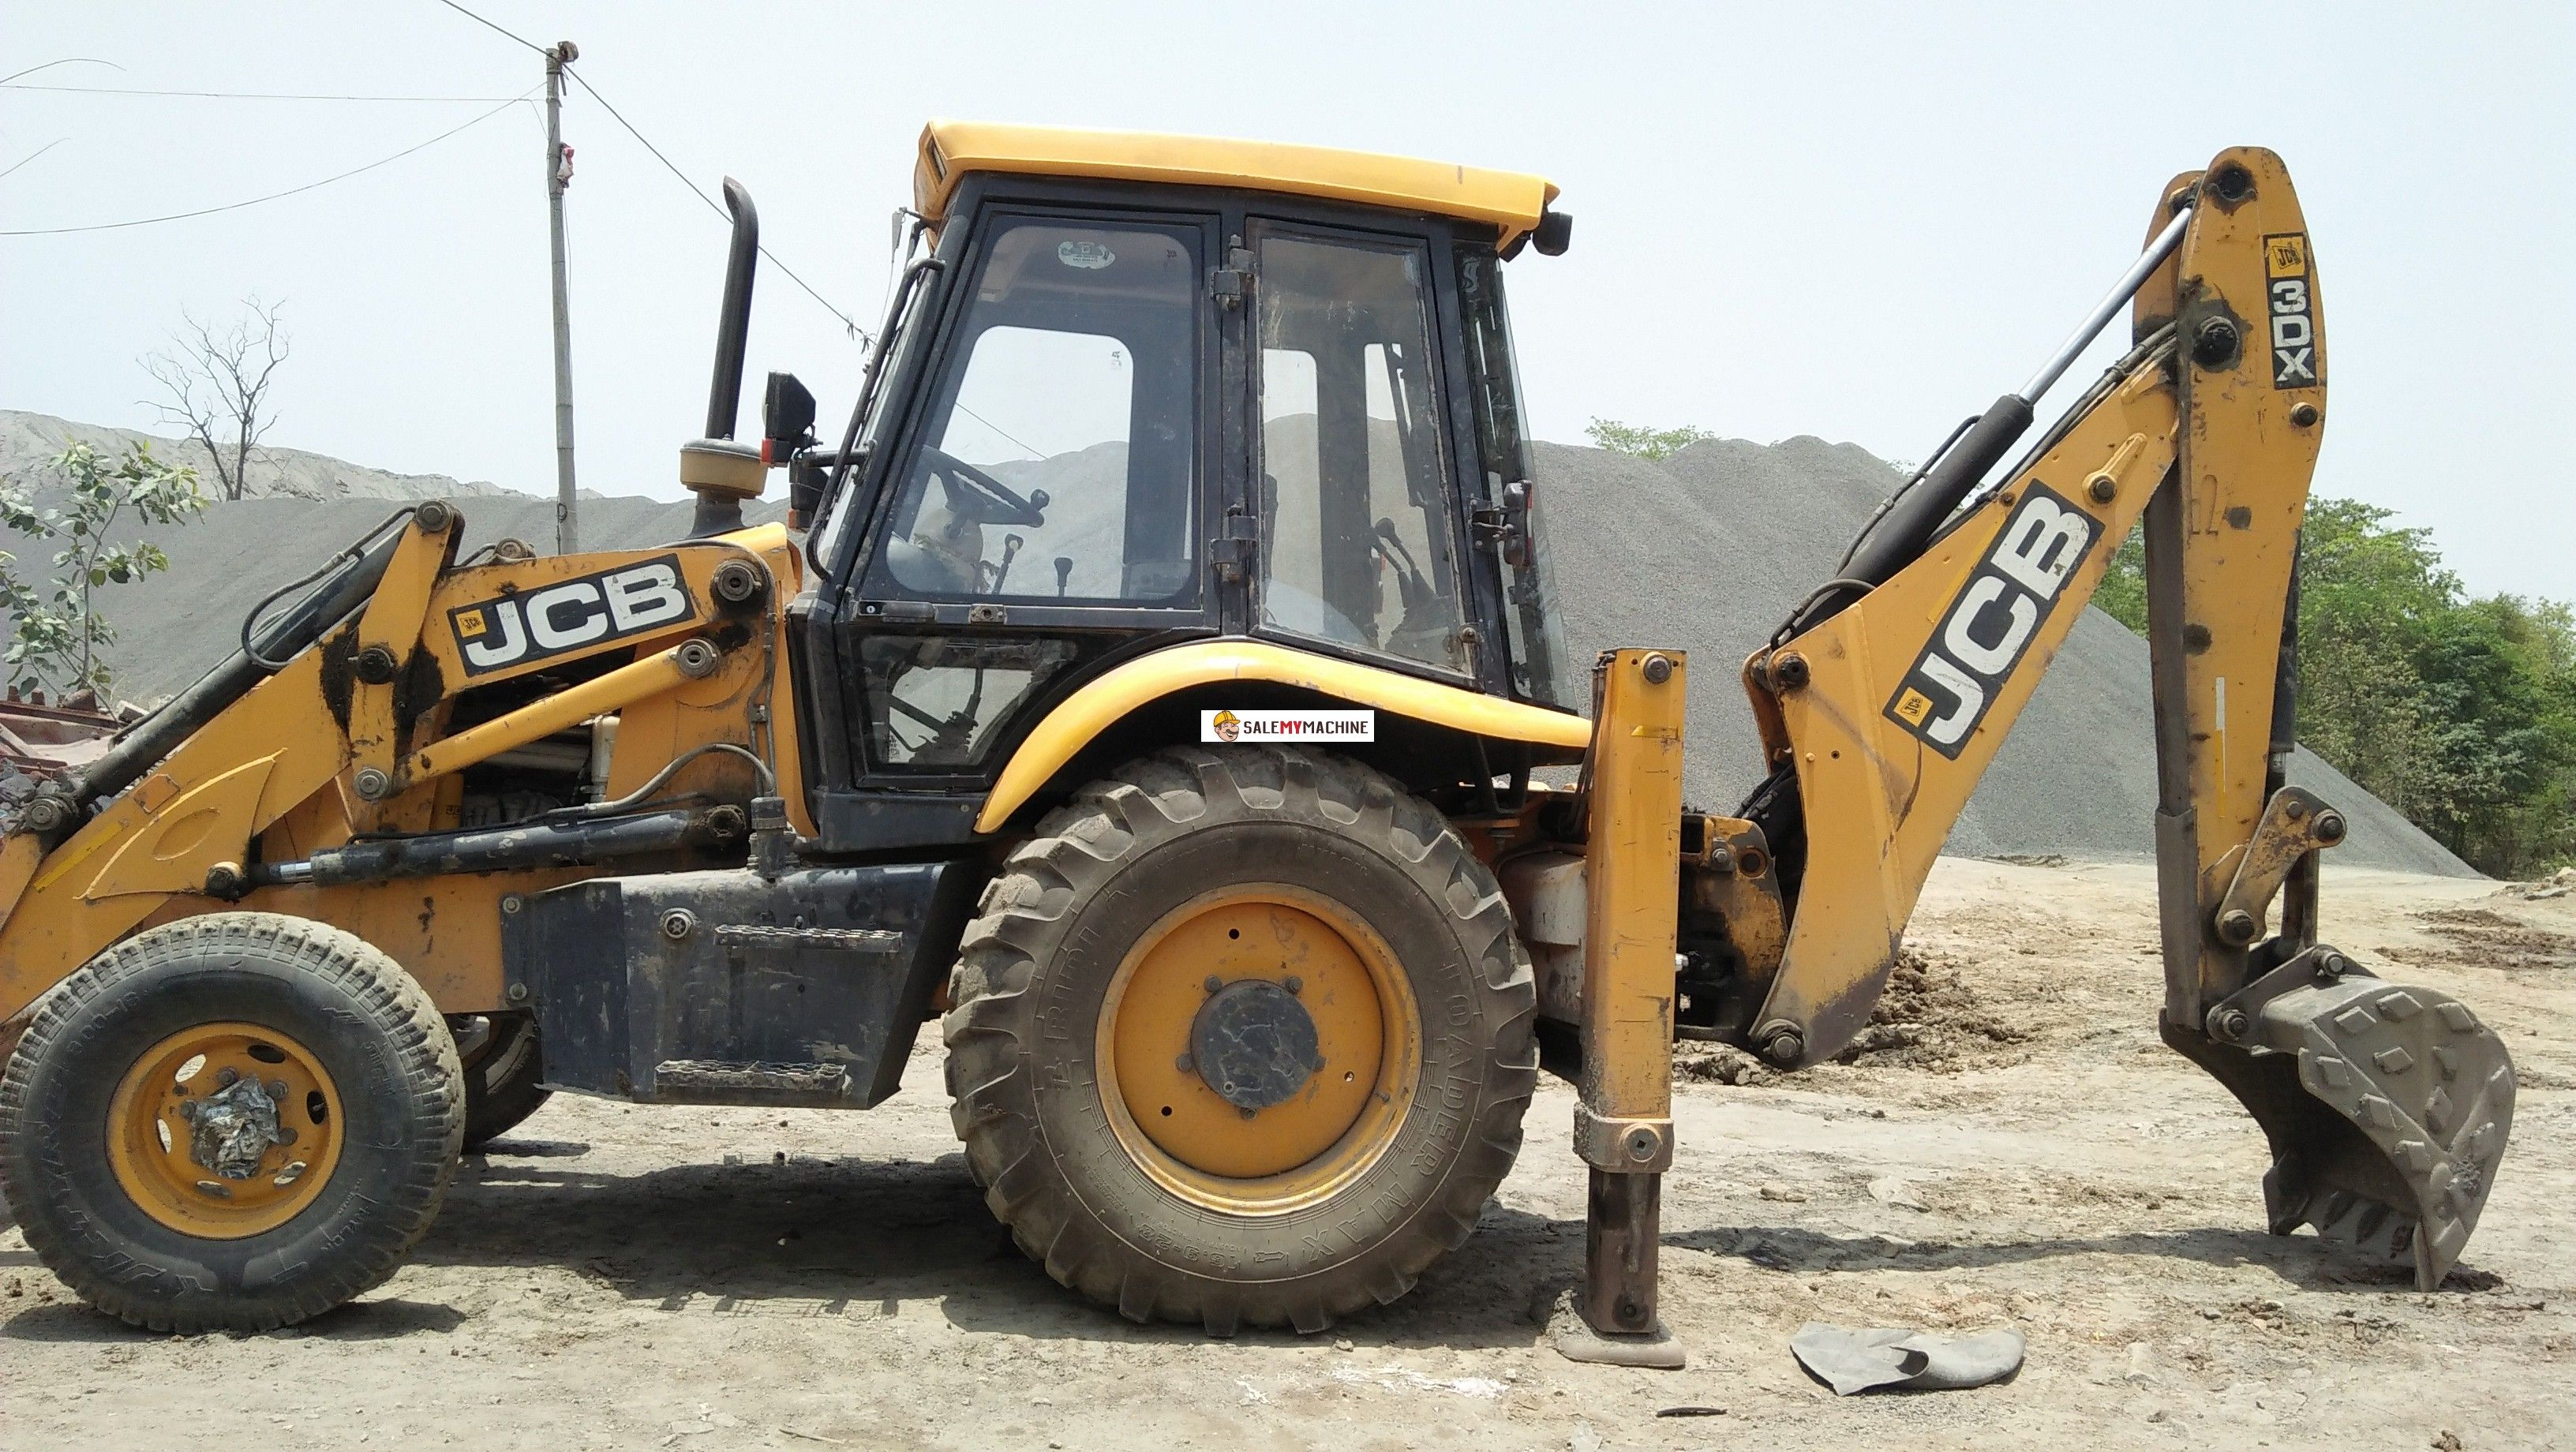 Used JCB 3DX for sale in odisha,india at salemymachine com